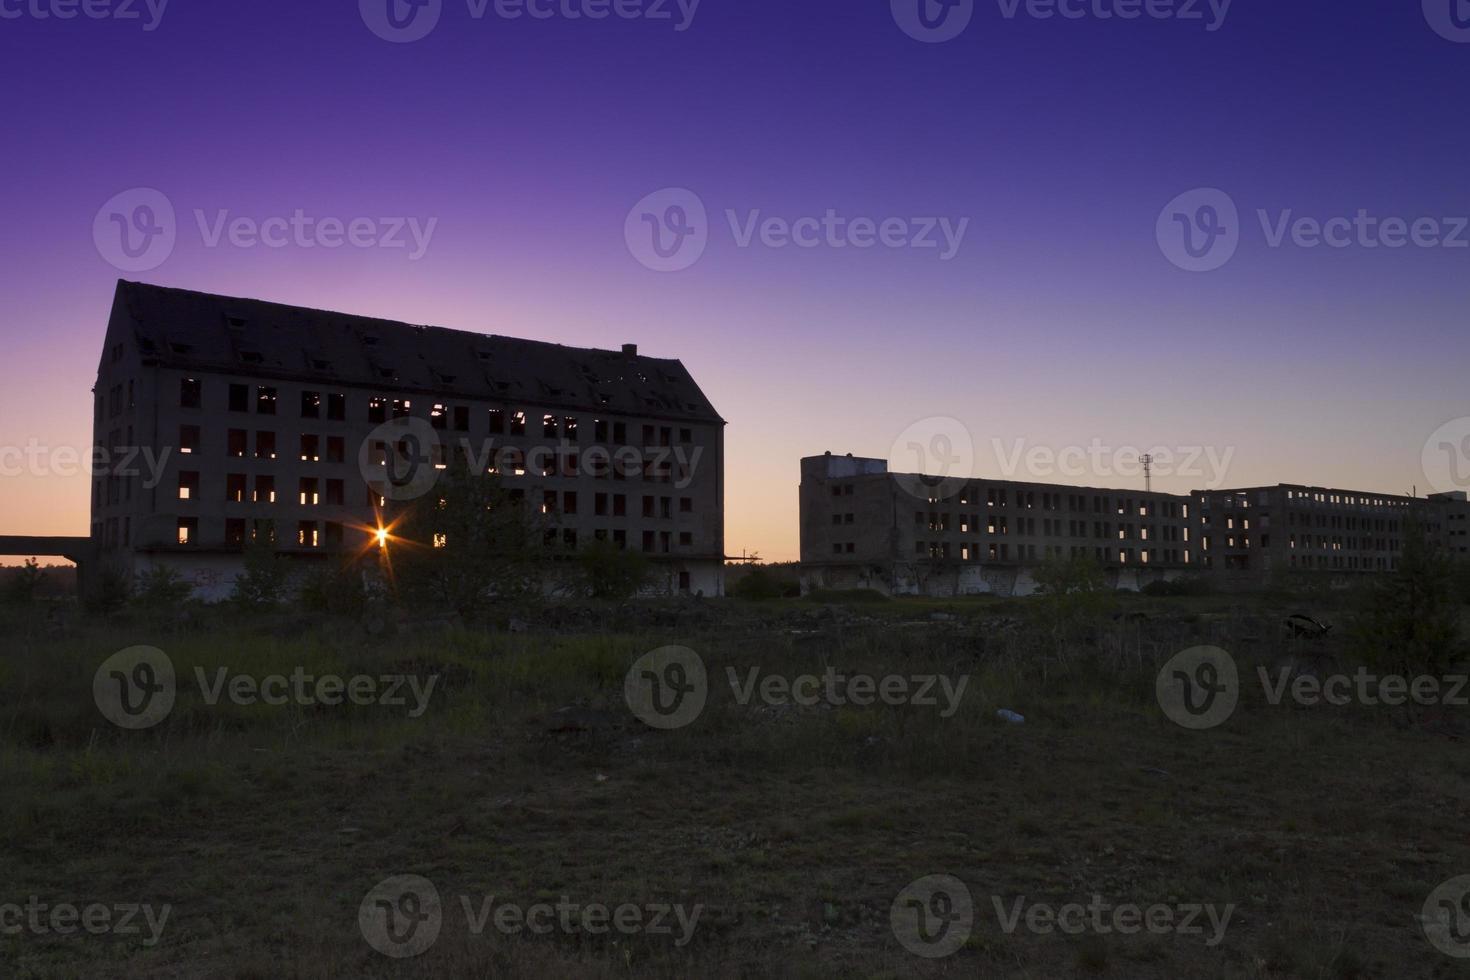 Polen, zachodniopomorskie, borne sulinowo, ruiner av en militär struktur foto